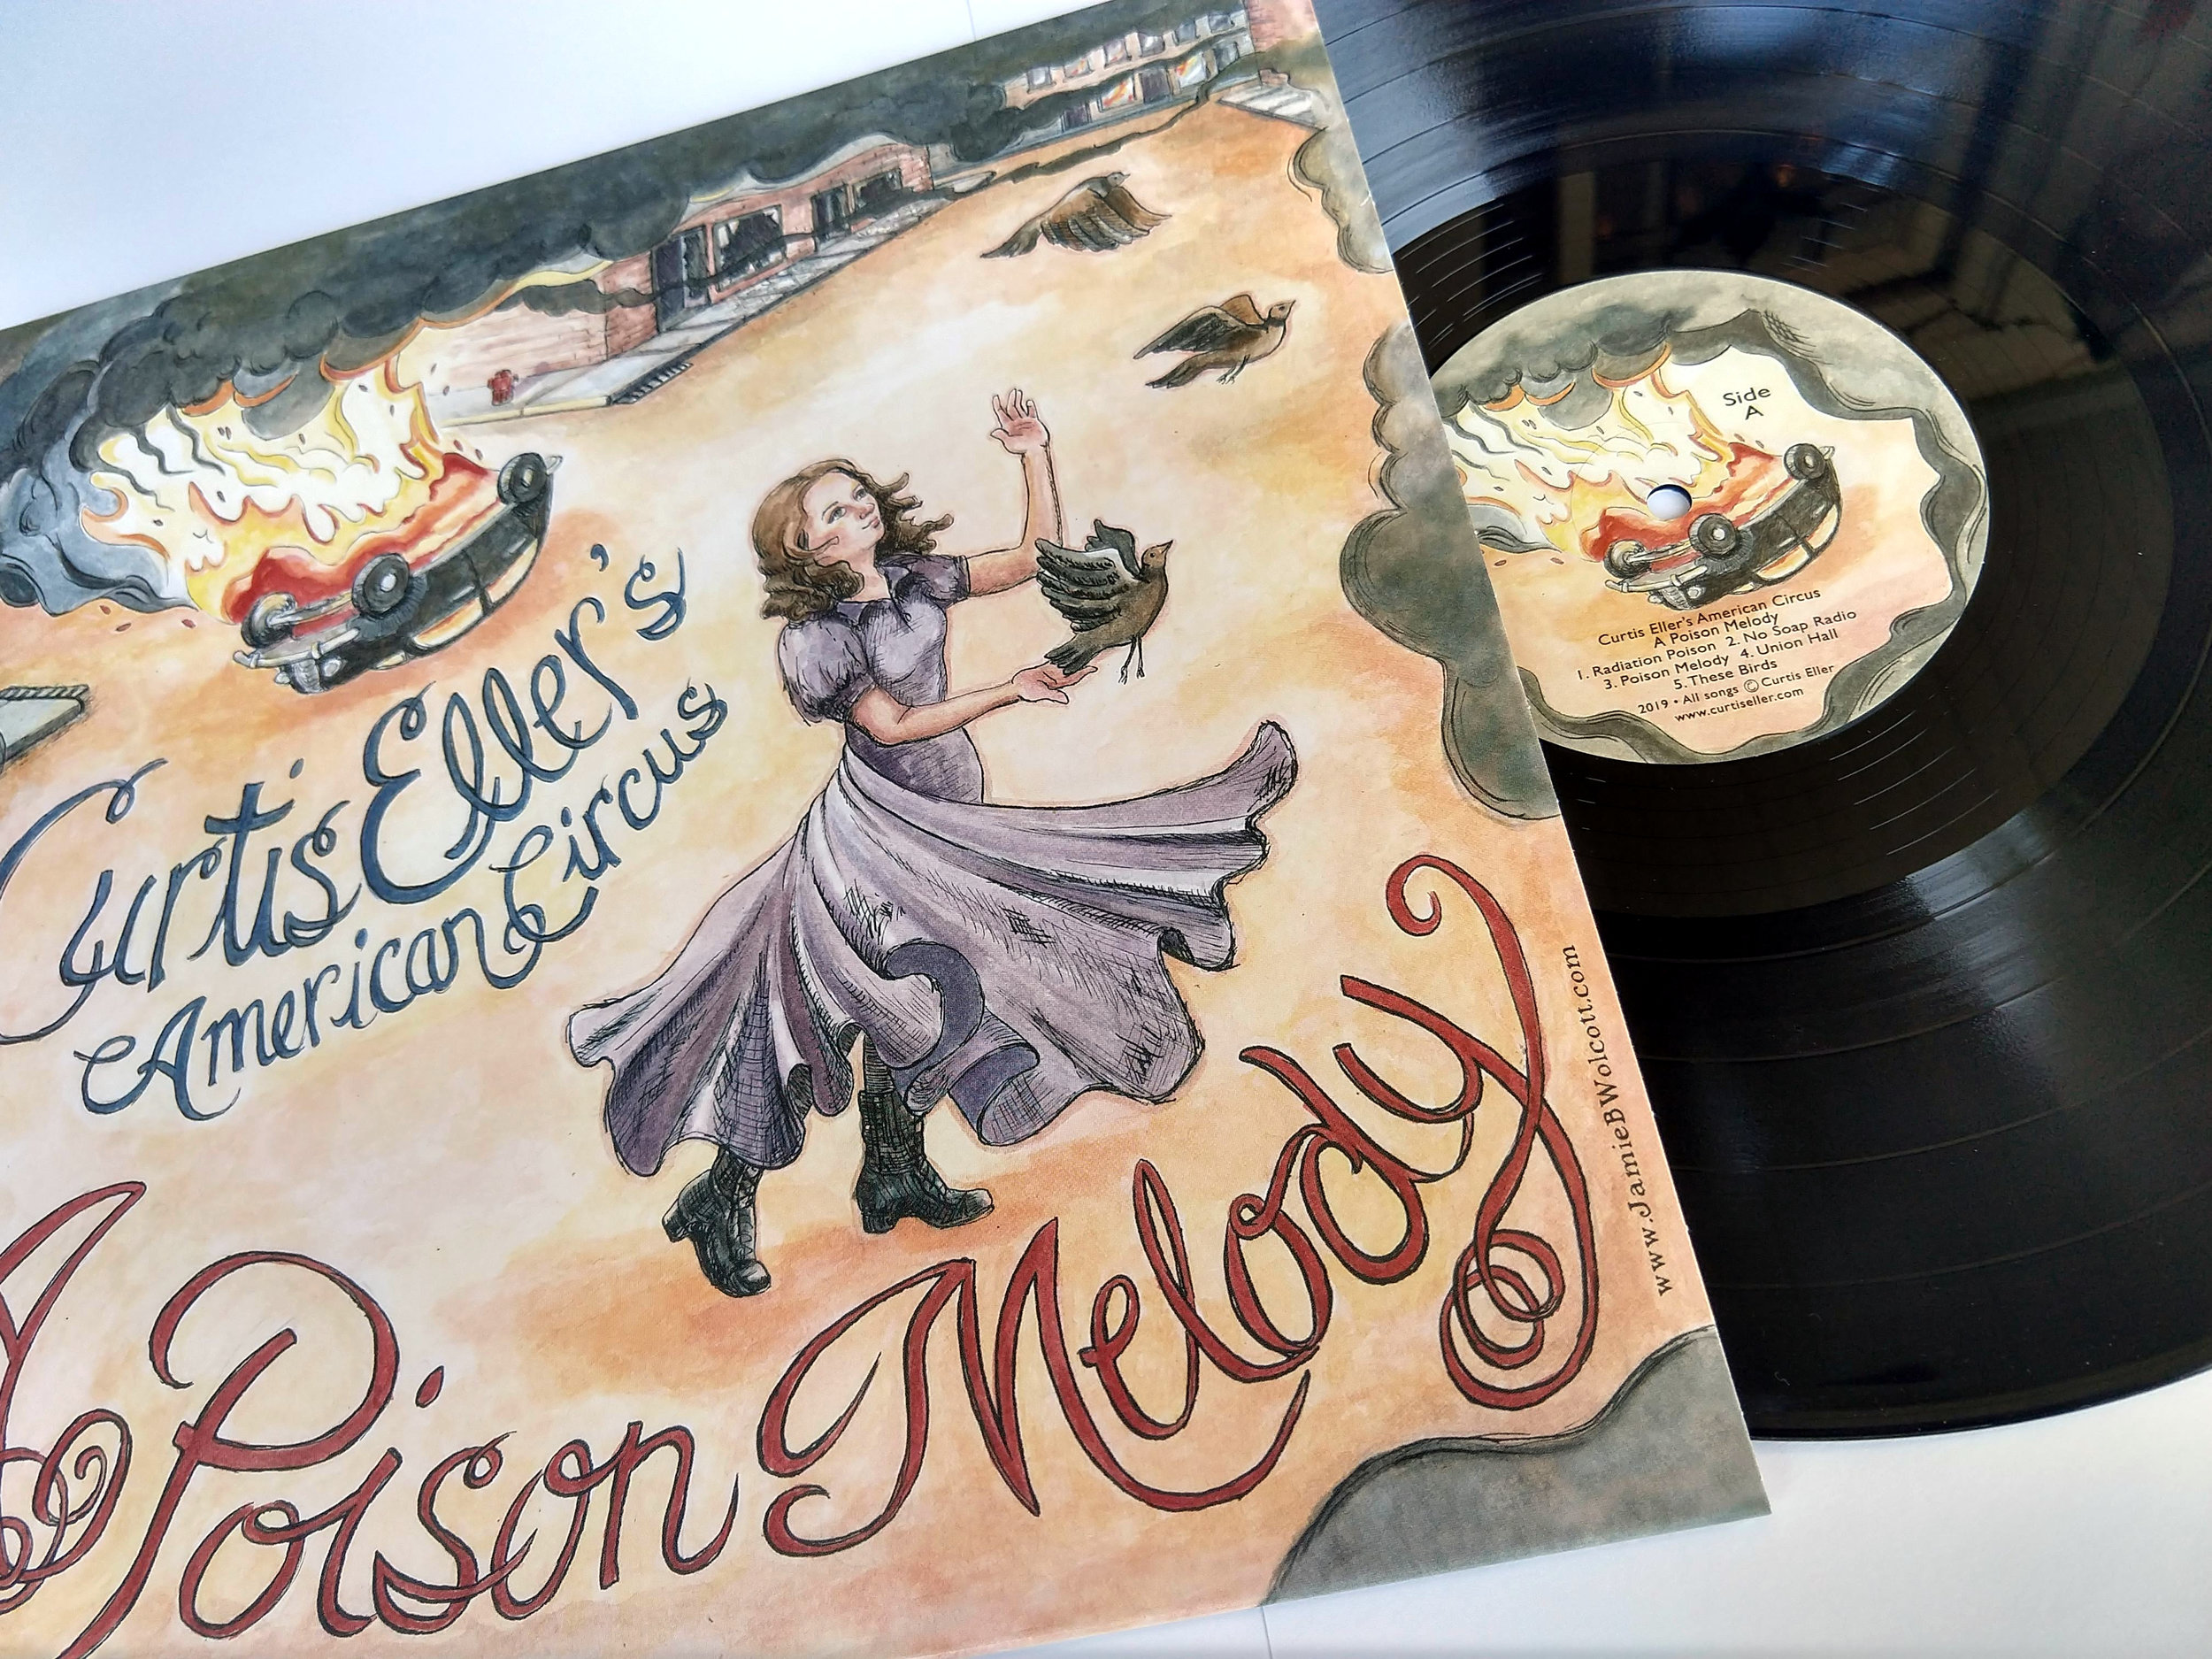 A Poison Melody (vinyl) $18 + shipping - 9 song album on classic, black vinyl